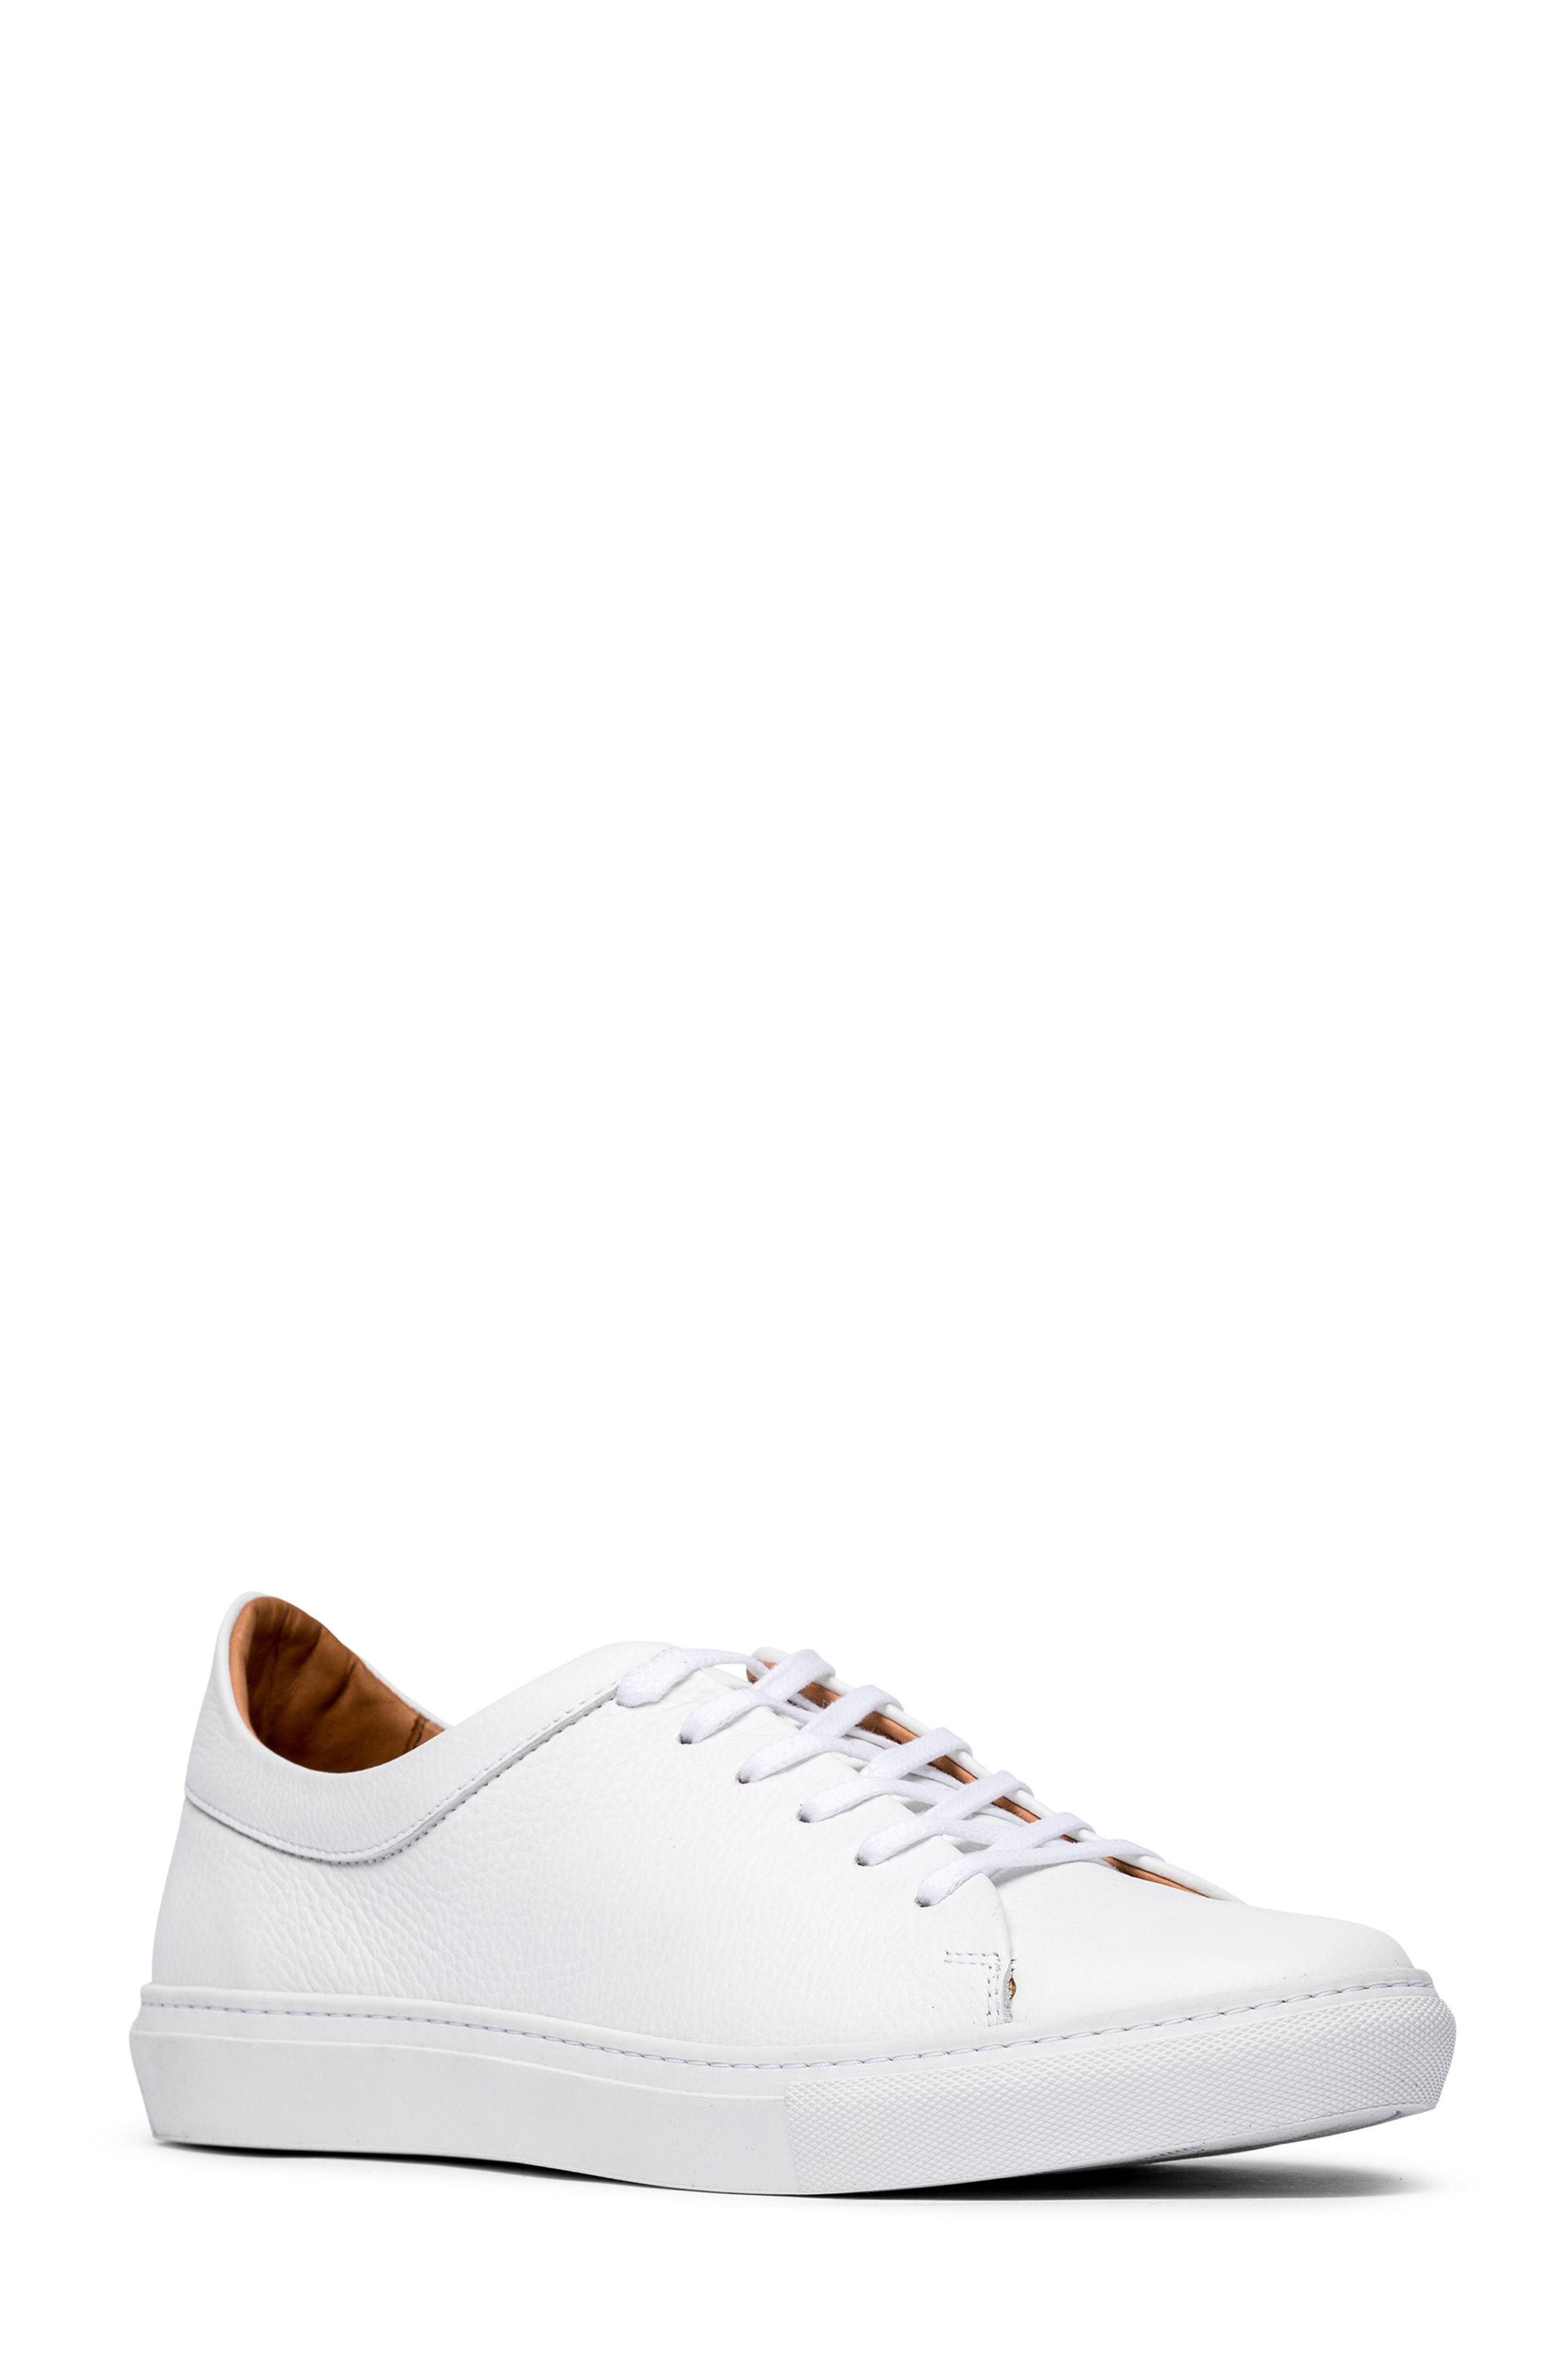 Rodd & Gunn Windemere Sneaker